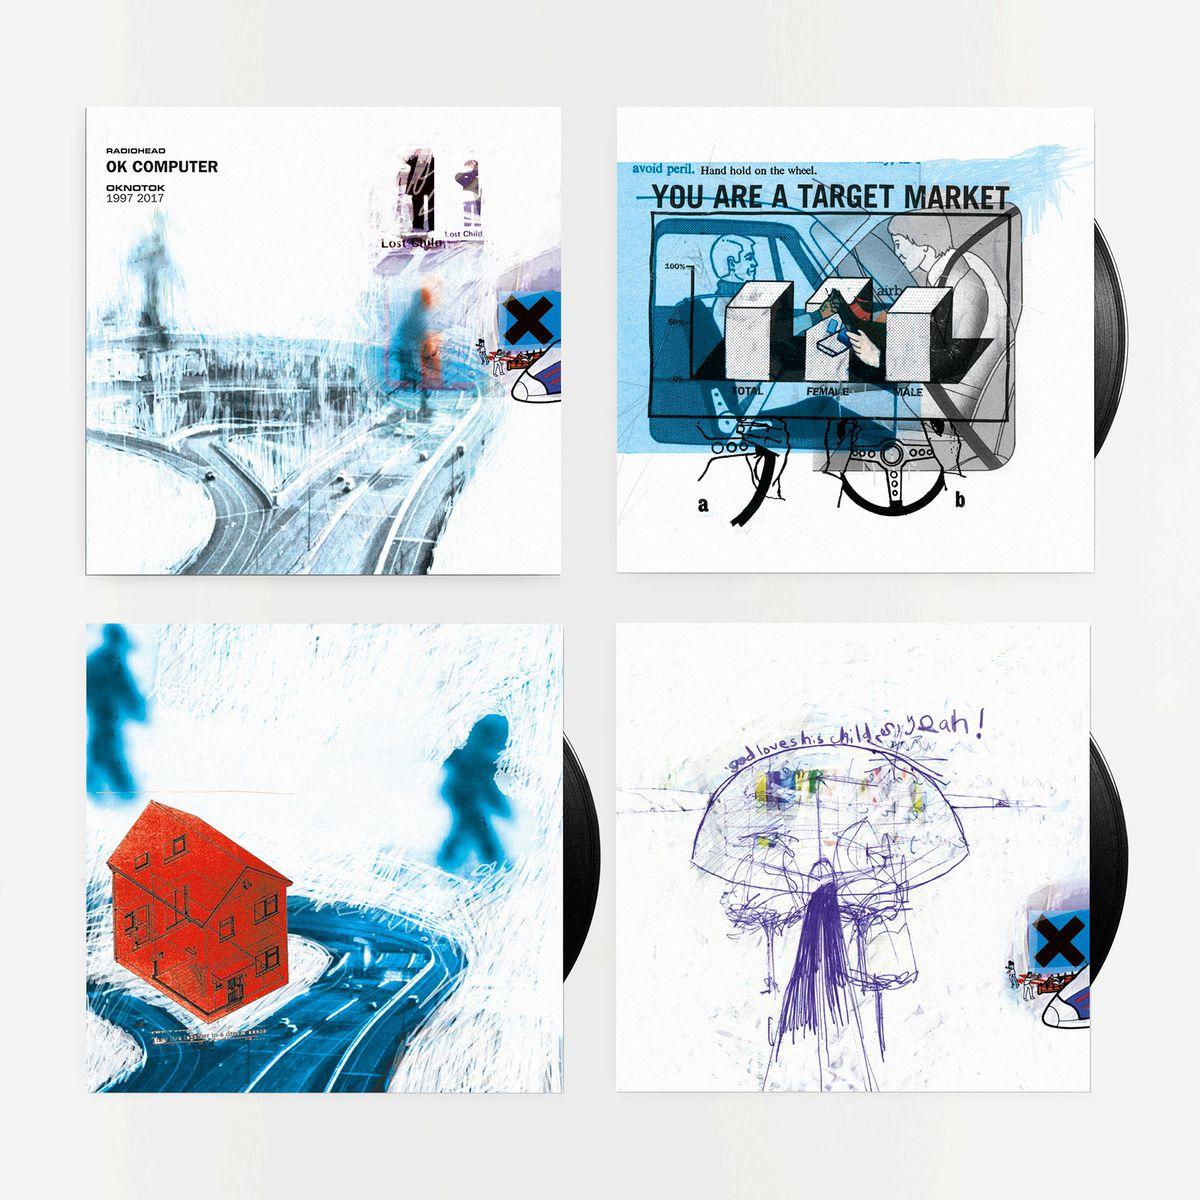 Radiohead hides 8-bit secret message in the remastered version of OK